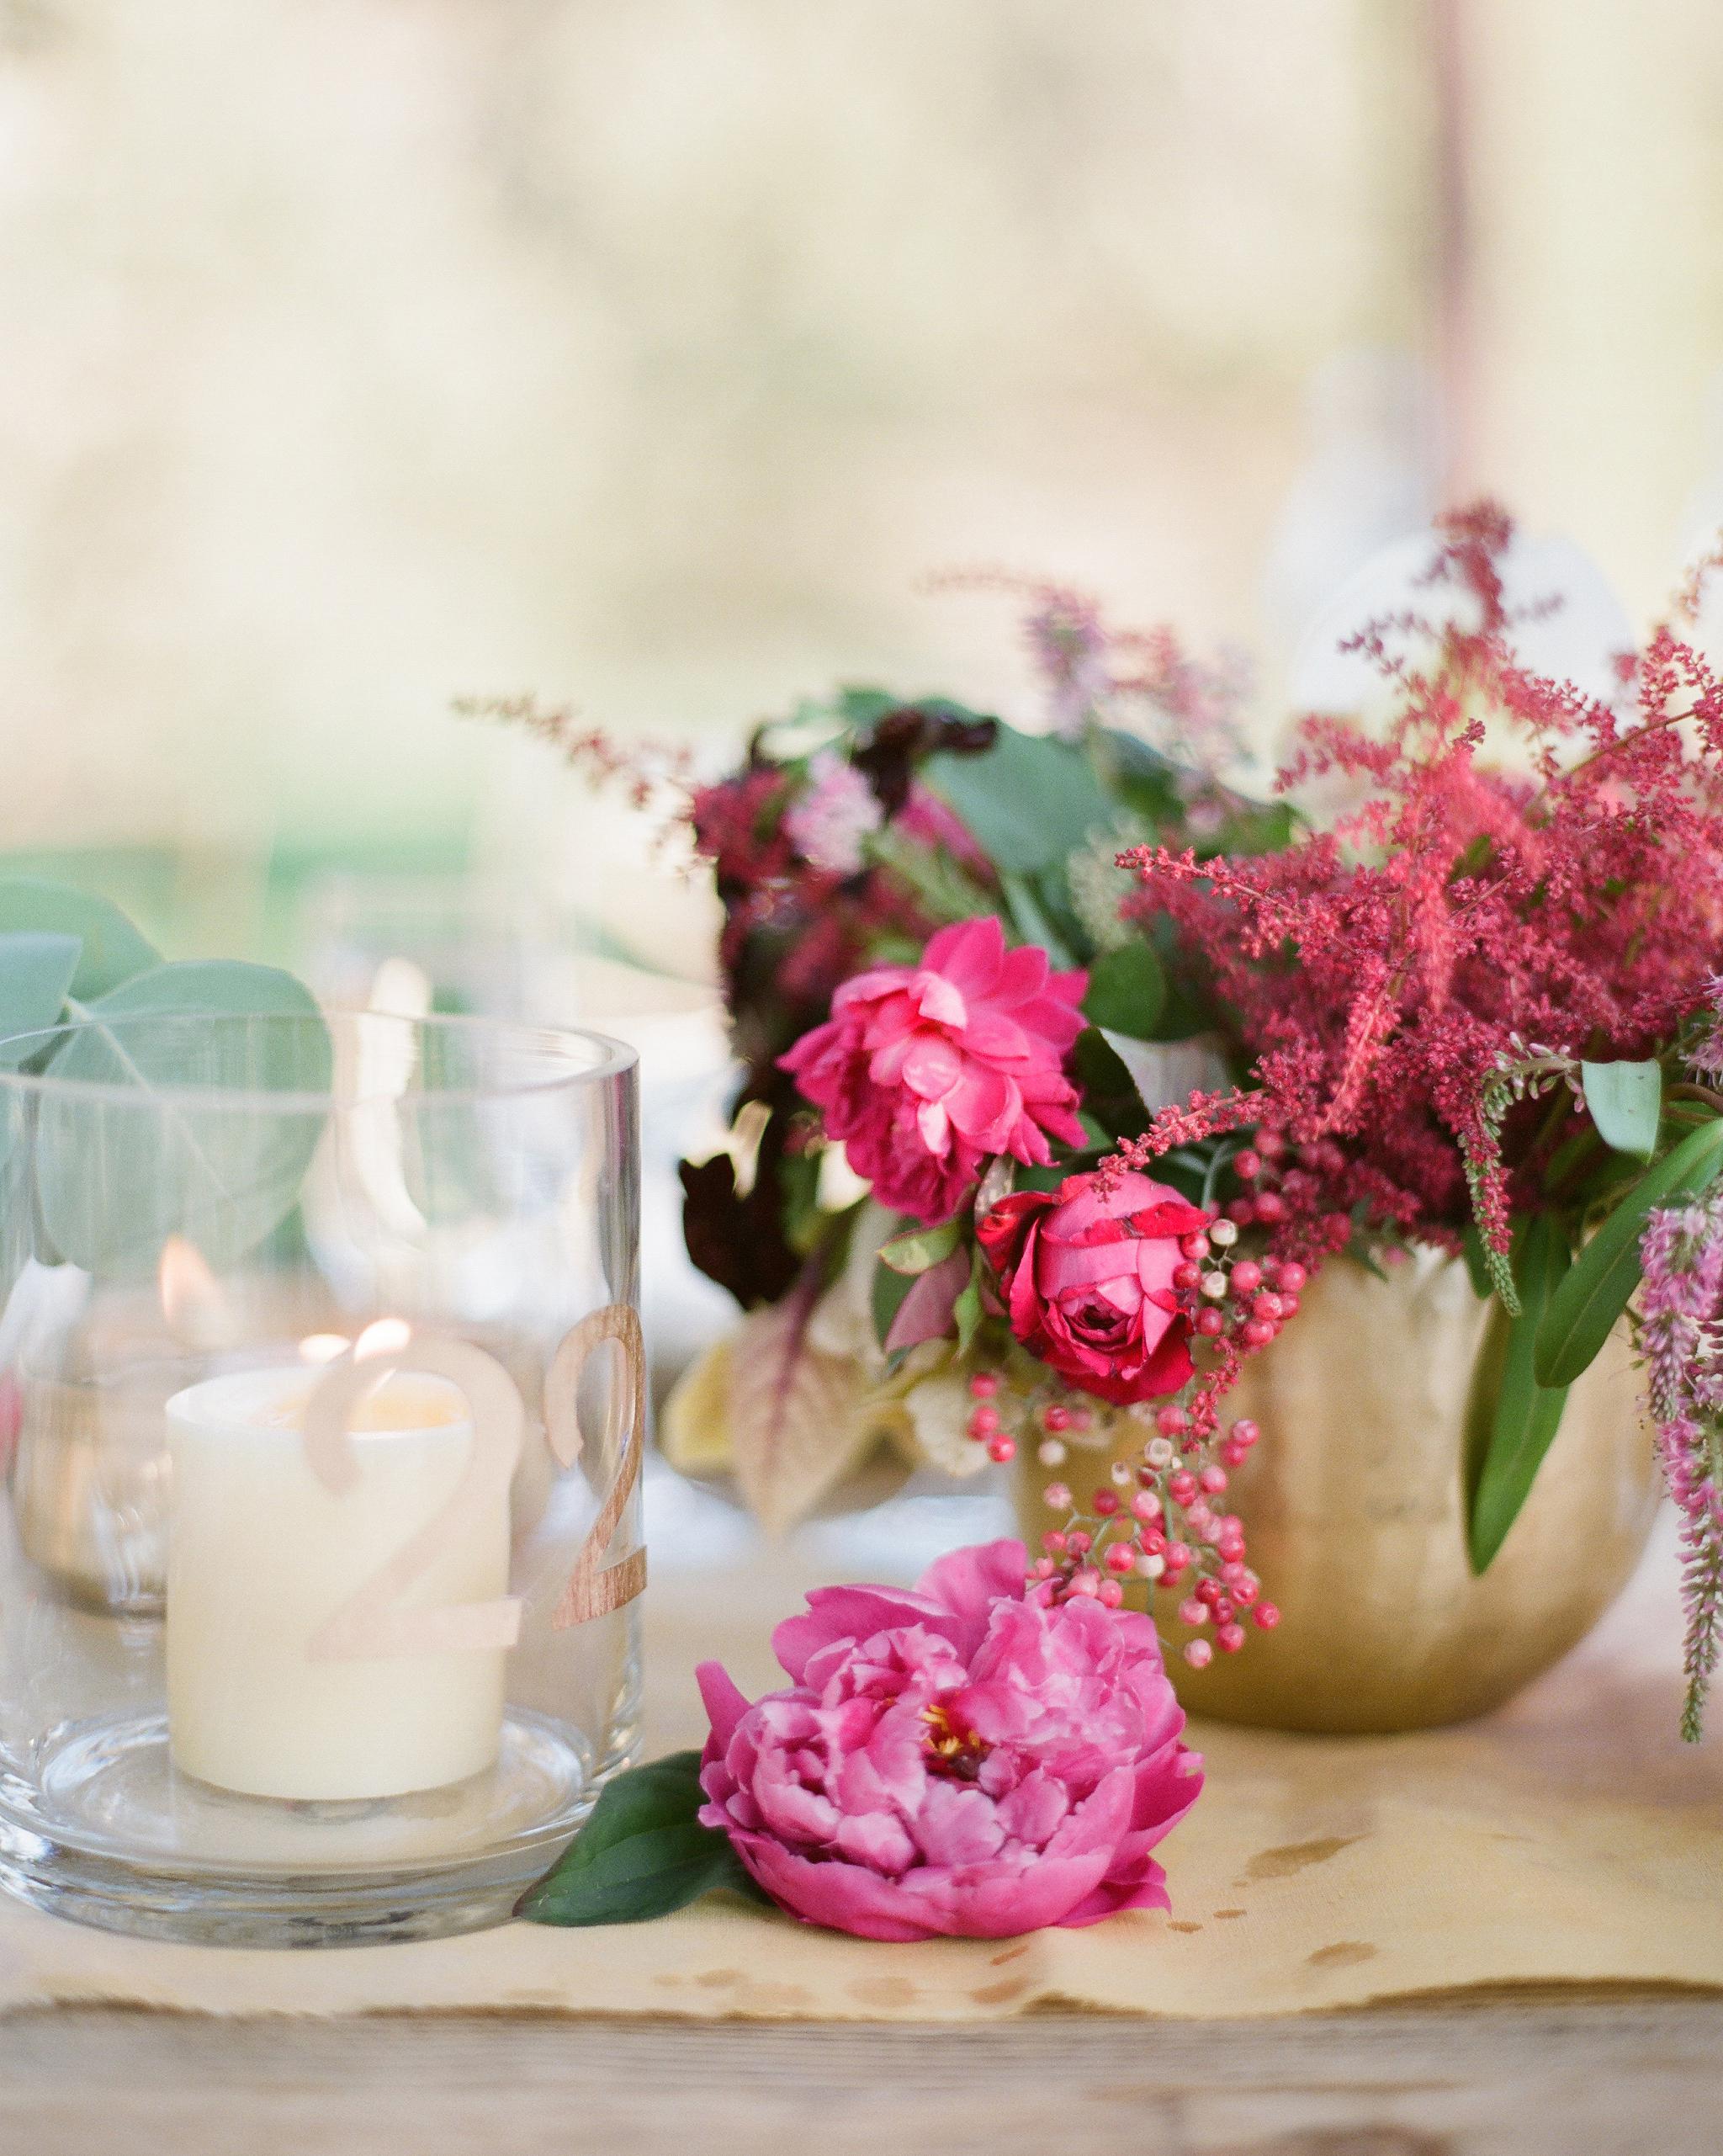 corrine-patrick-wedding-santa-ynez-44730006-s110842-0215.jpg